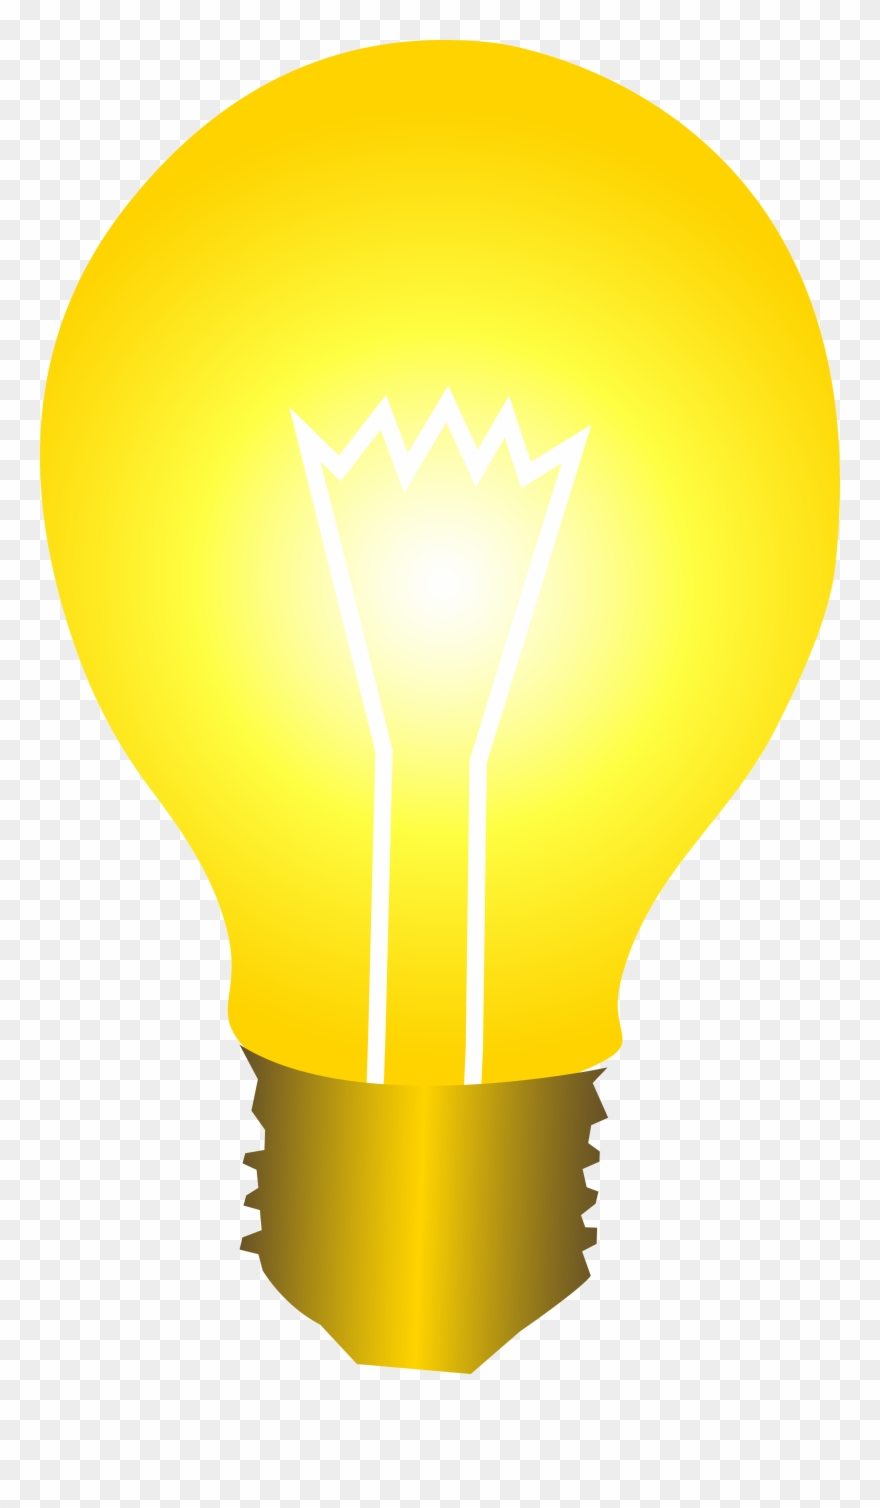 Bright Yellow Idea Light Bulb Free Clip Art - Light Bulb ...